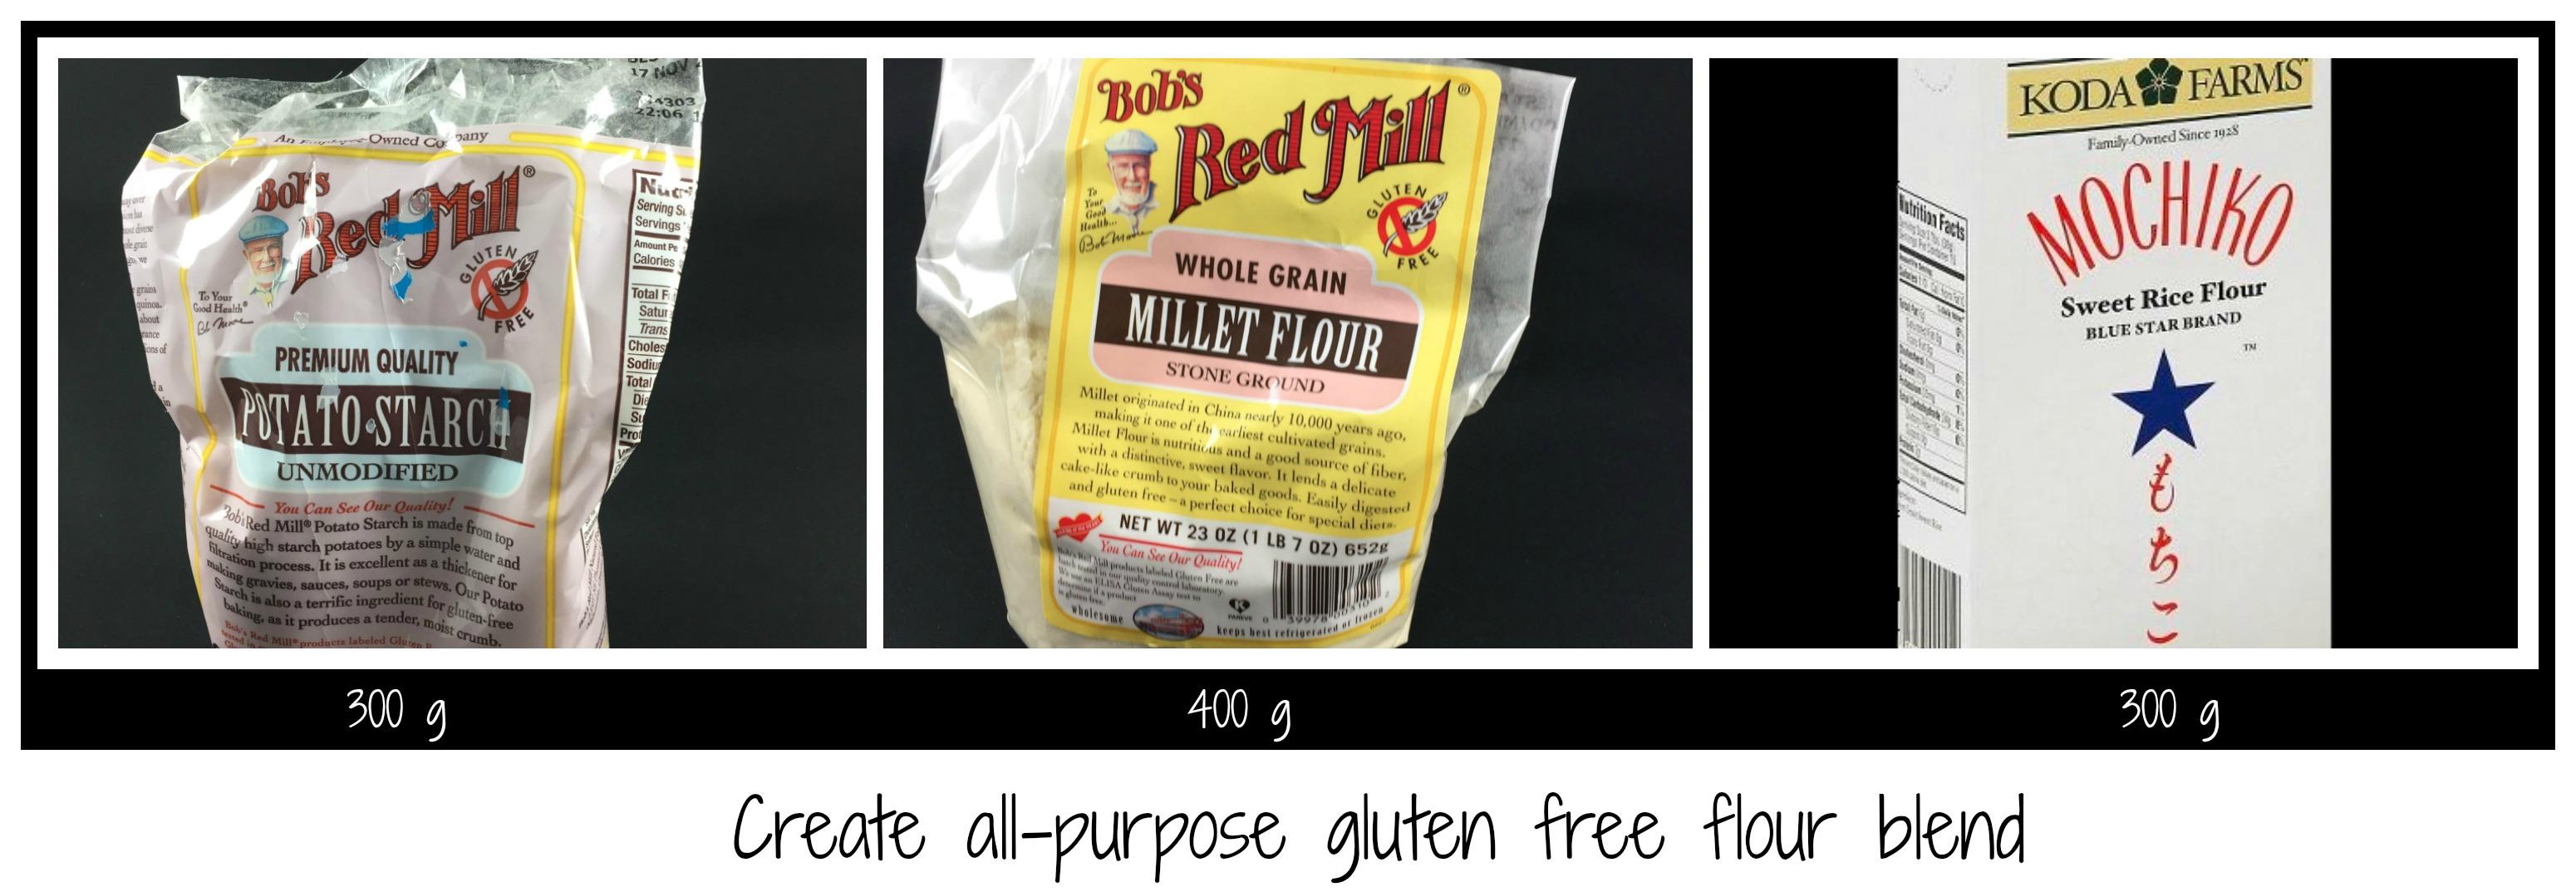 Picture of All-purpose Gluten Free Flour Blend Recipe